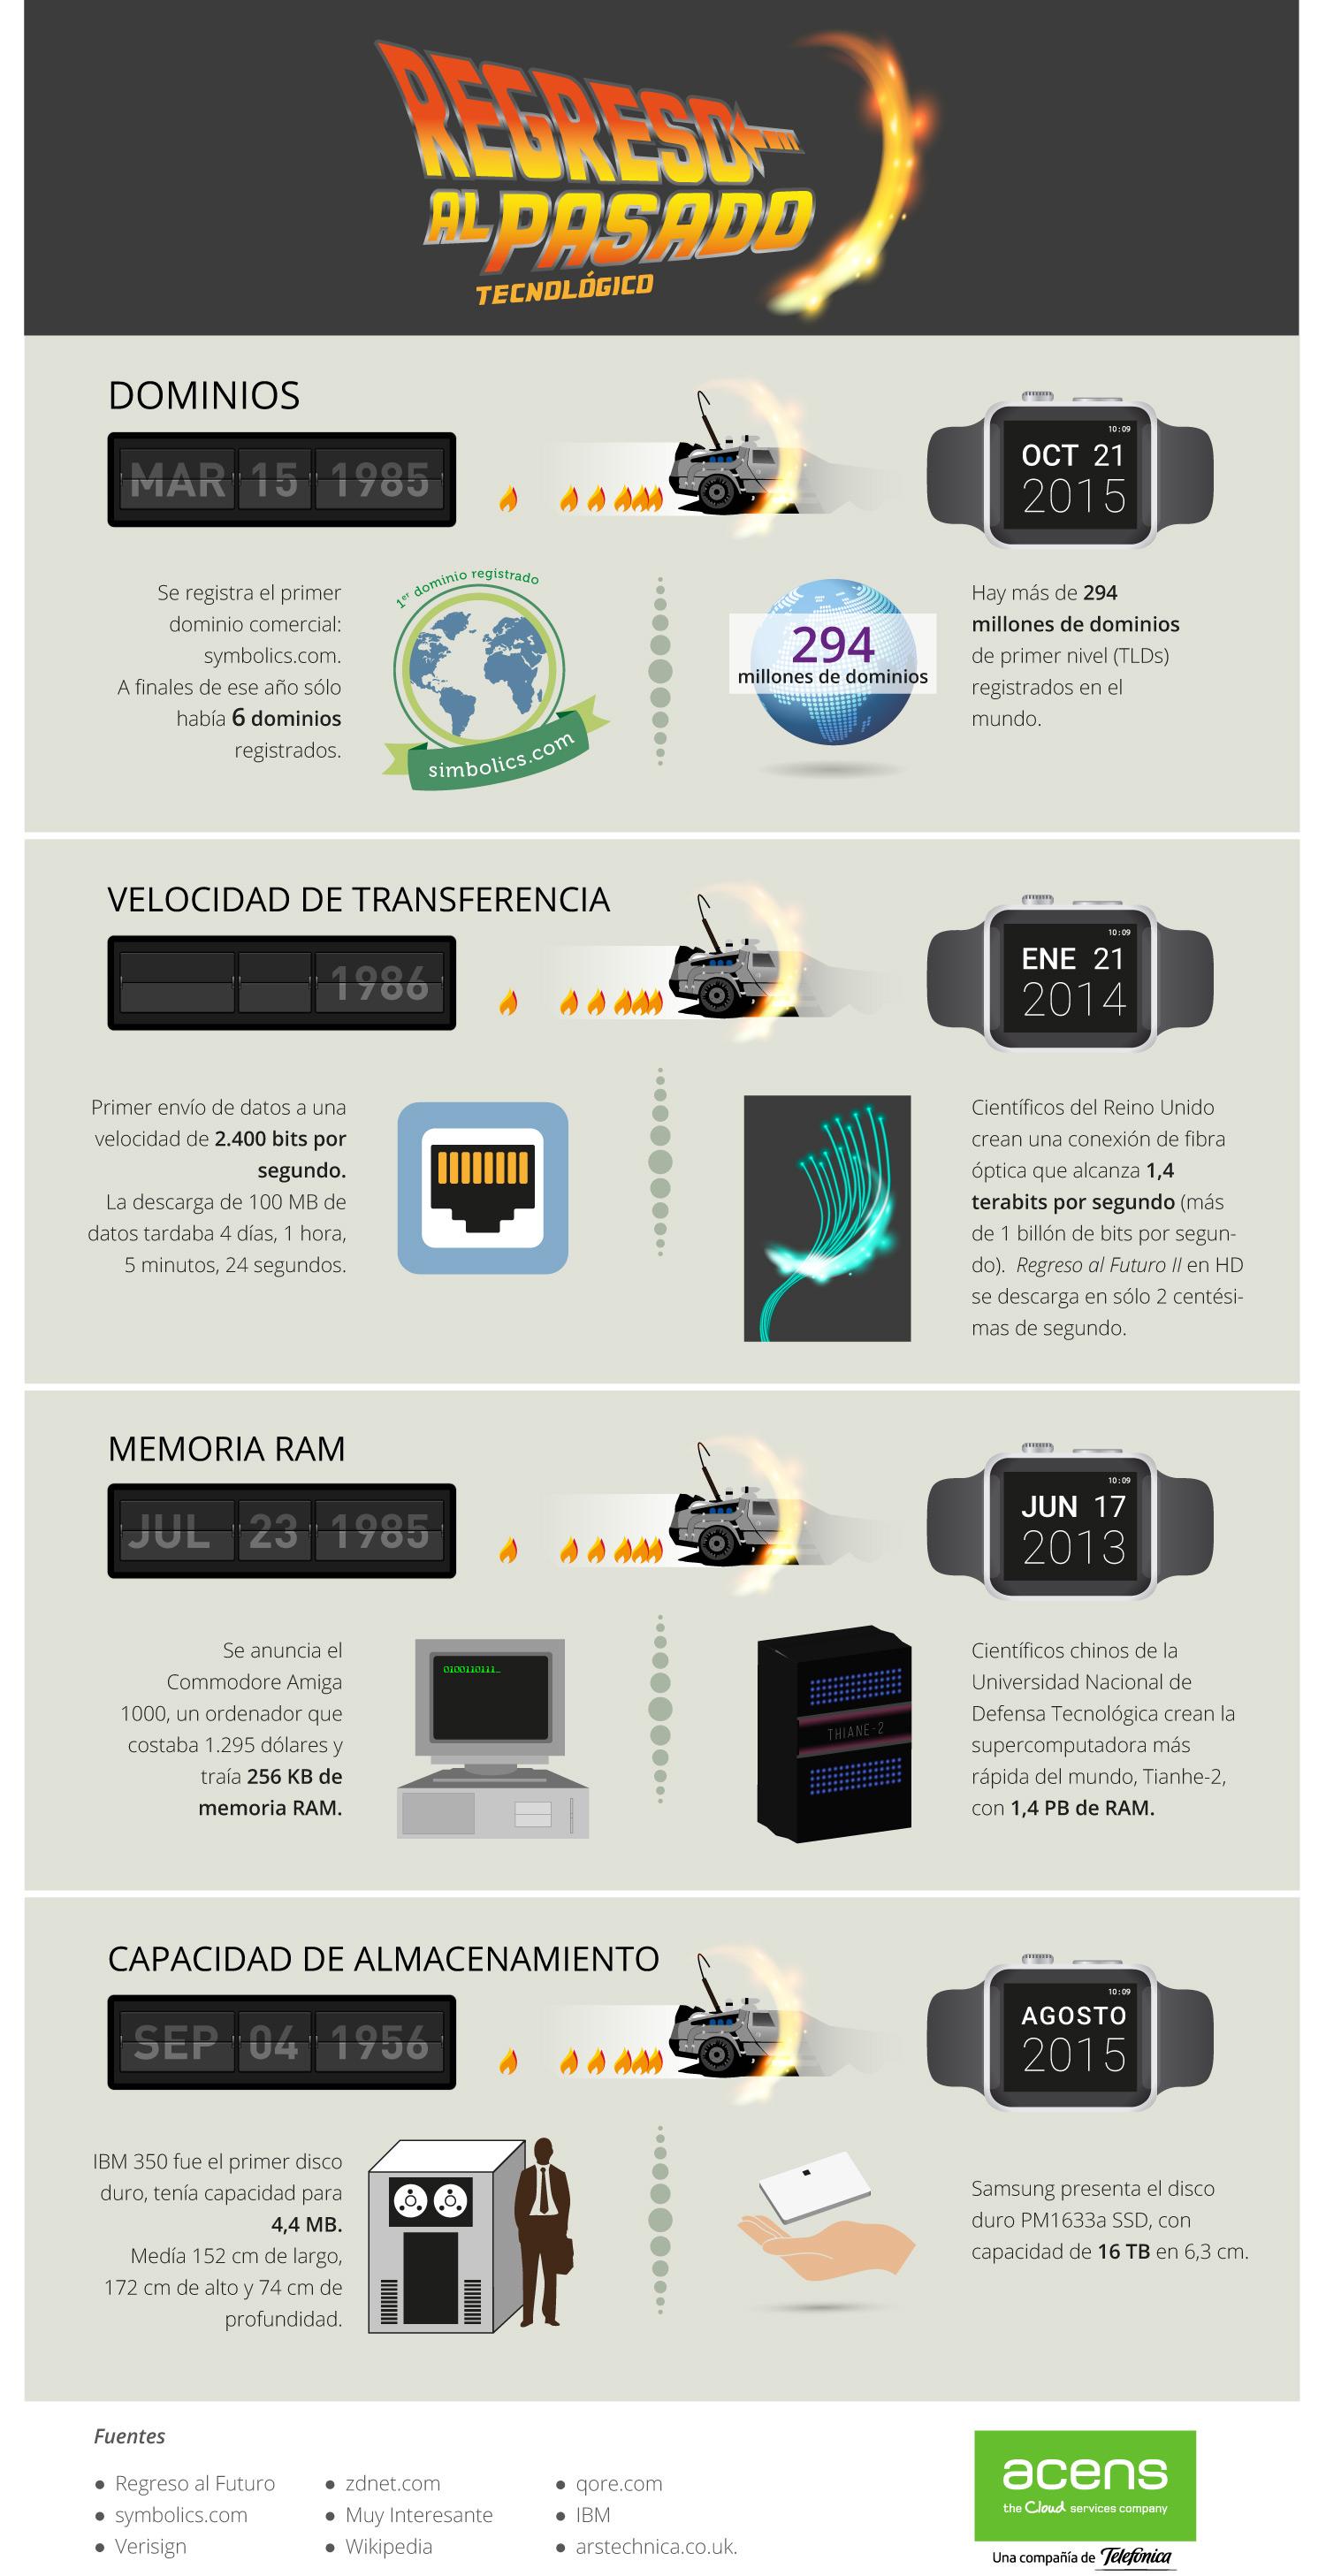 infografia-regreso-pasado-tecnologico-2015-acens